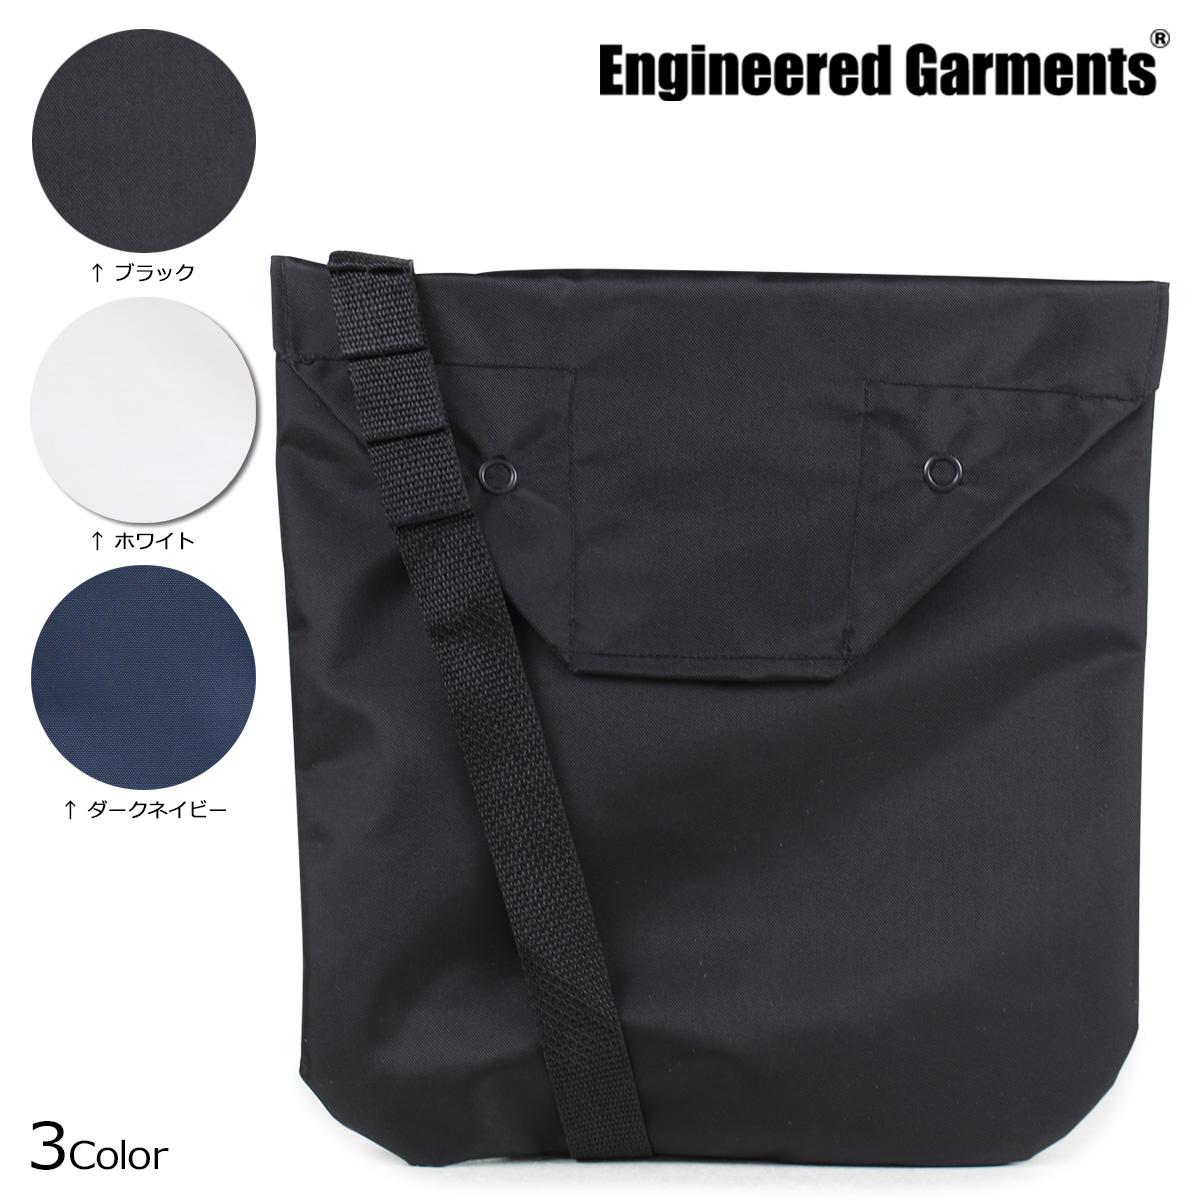 ENGINEERED GARMENTS SHOULDER POUCH エンジニアドガーメンツ バッグ メンズ レディース ショルダーバッグ ブラック ホワイト ネイビー [184]